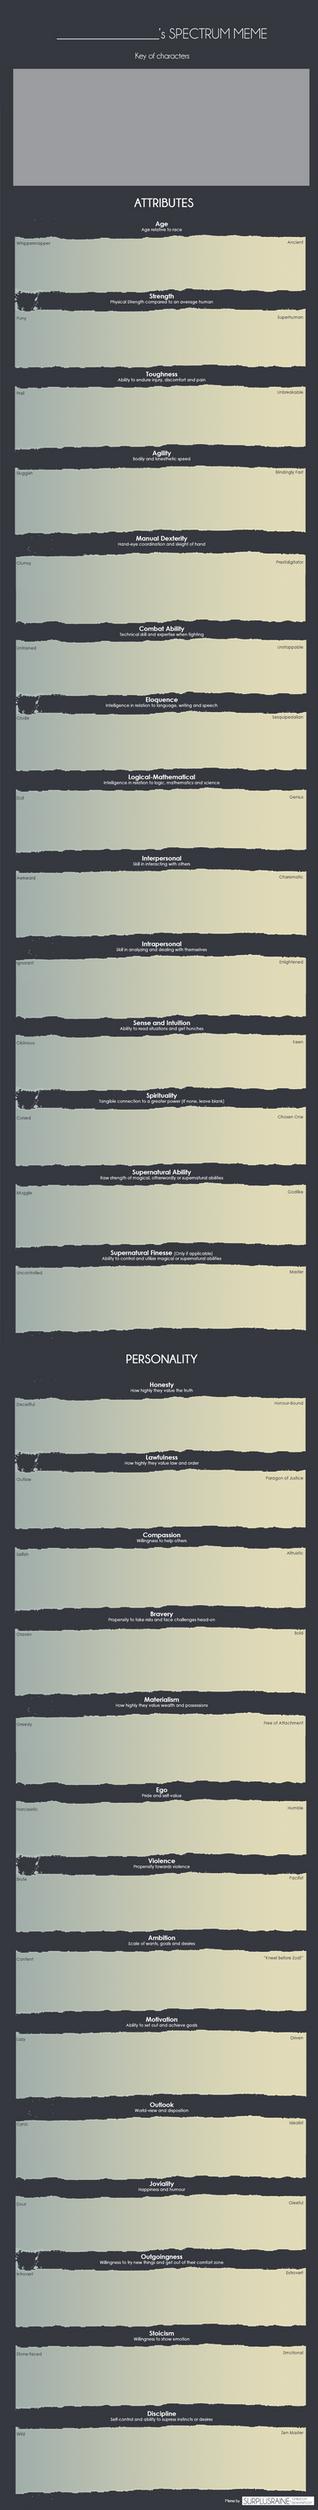 Character Spectrum Meme - Blank Template